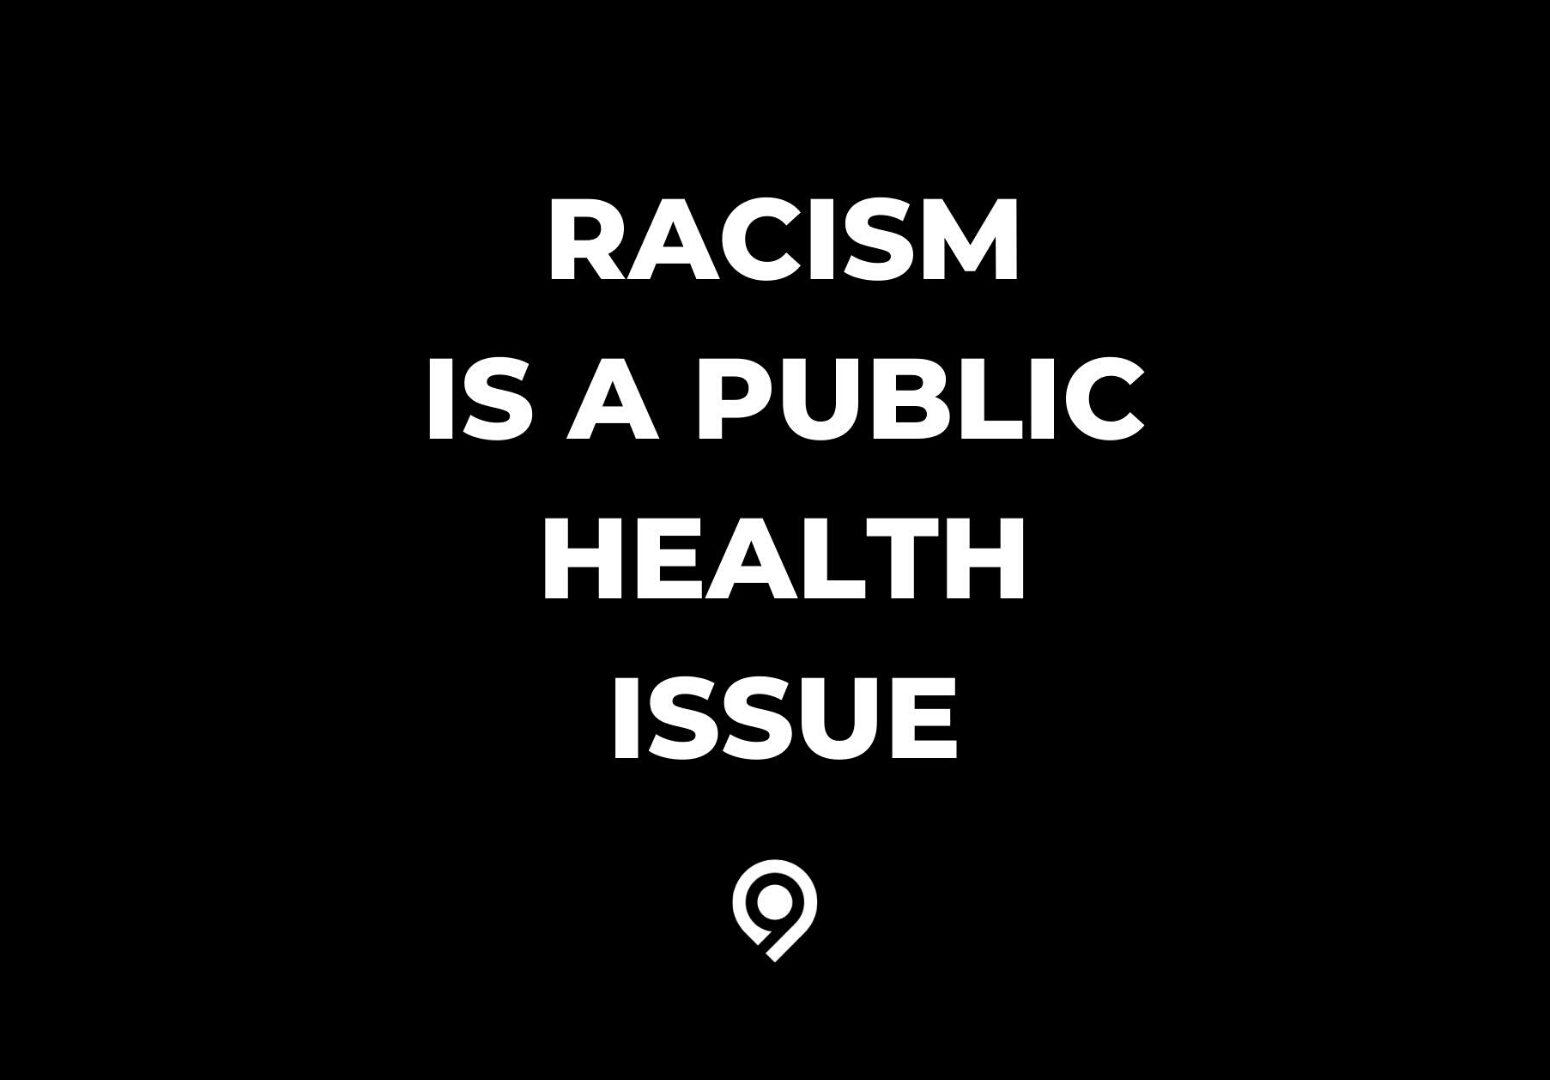 Racism-Public-Health-CrossFit9